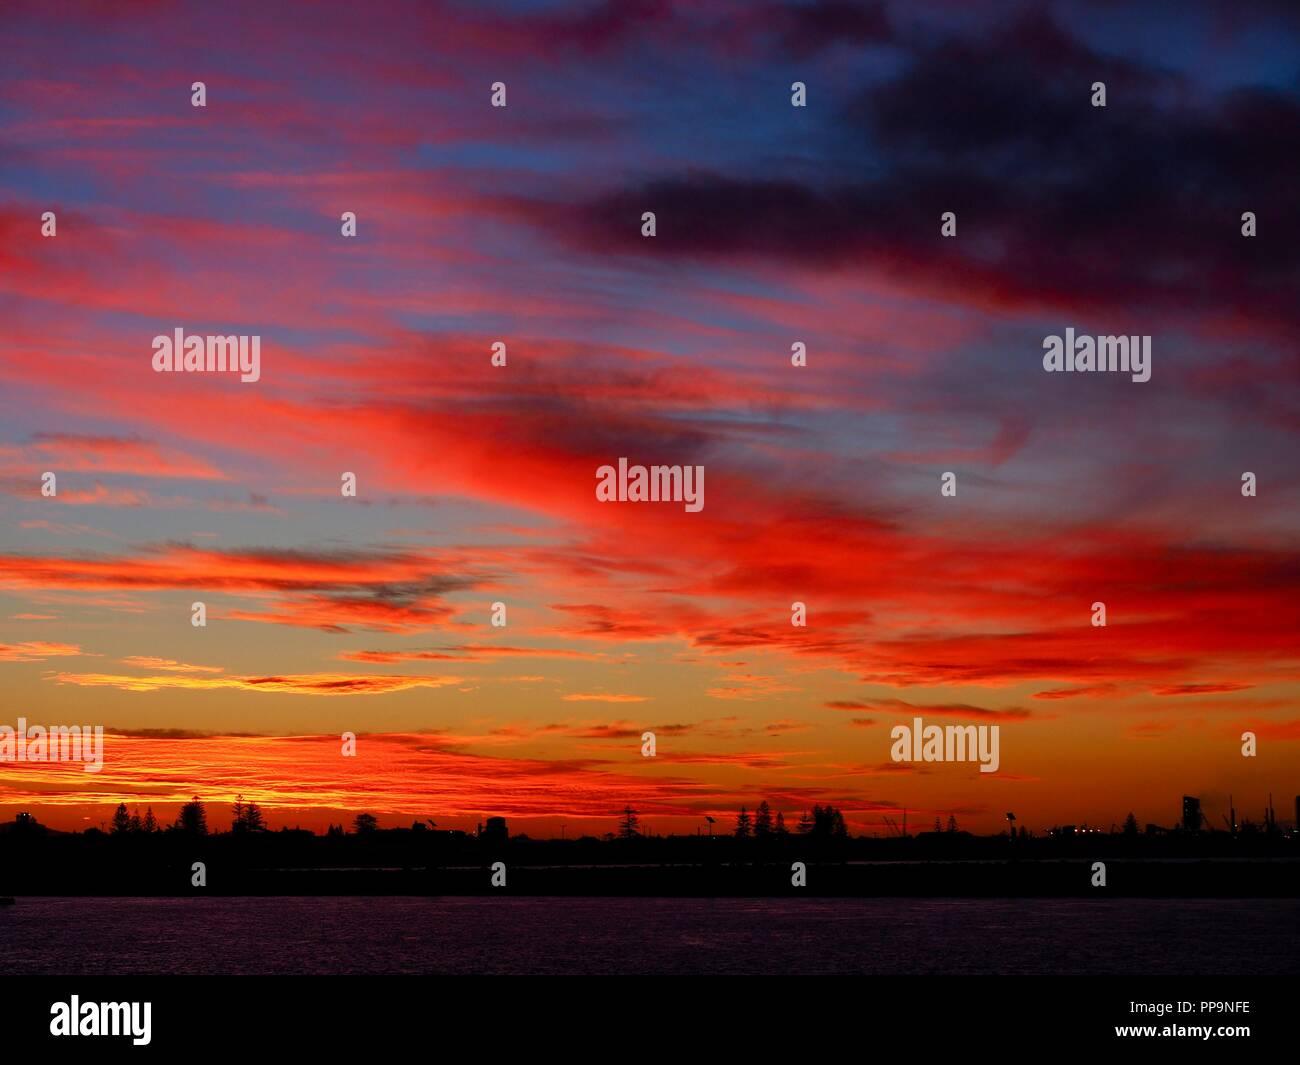 Sunset seen from Nobby's Breakwall, Newcastle NSW - Stock Image